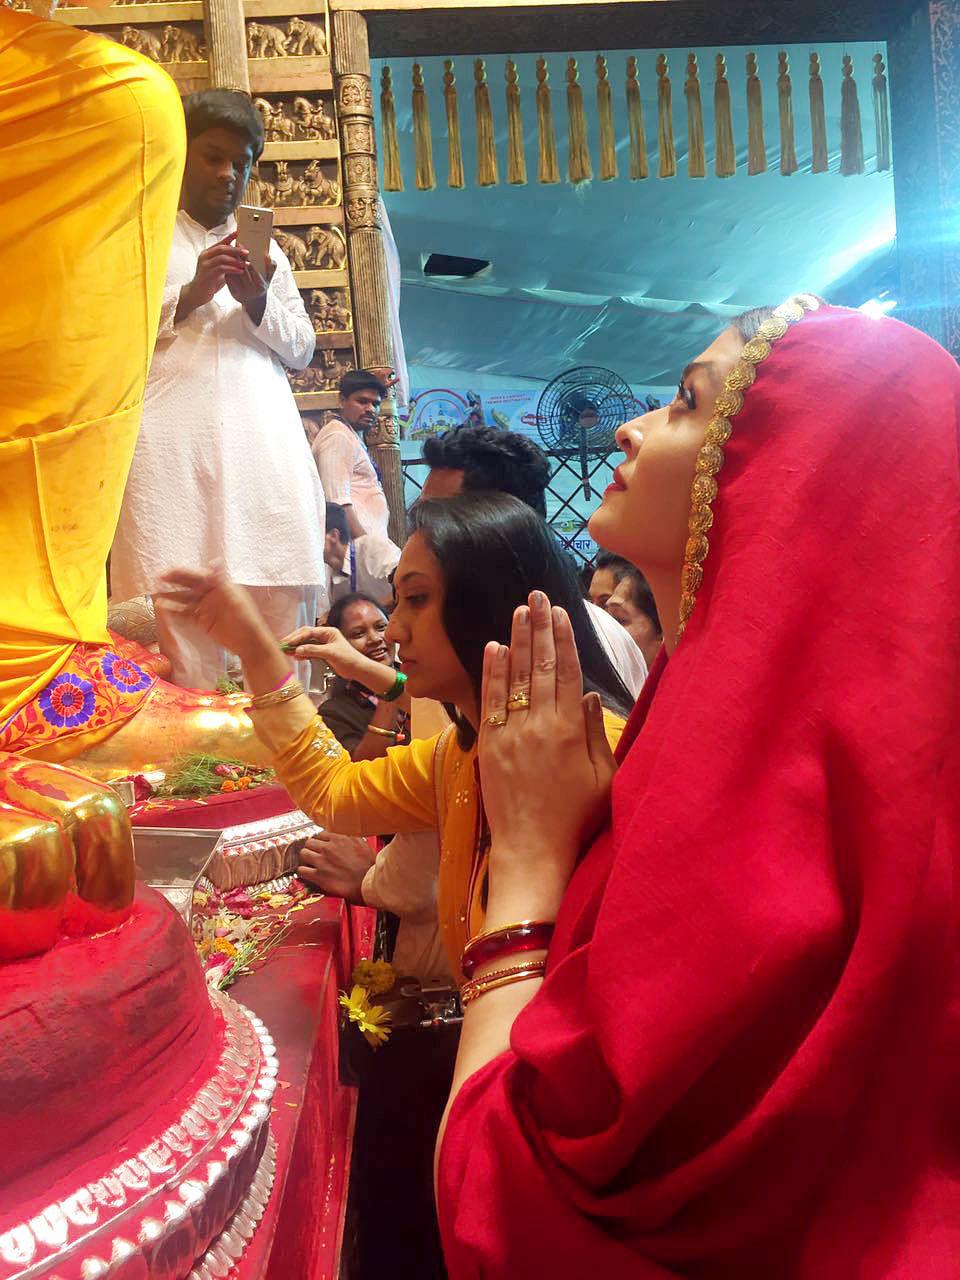 Aishwarya Rai Bachchan looks up at the enormous Ganpati idol.